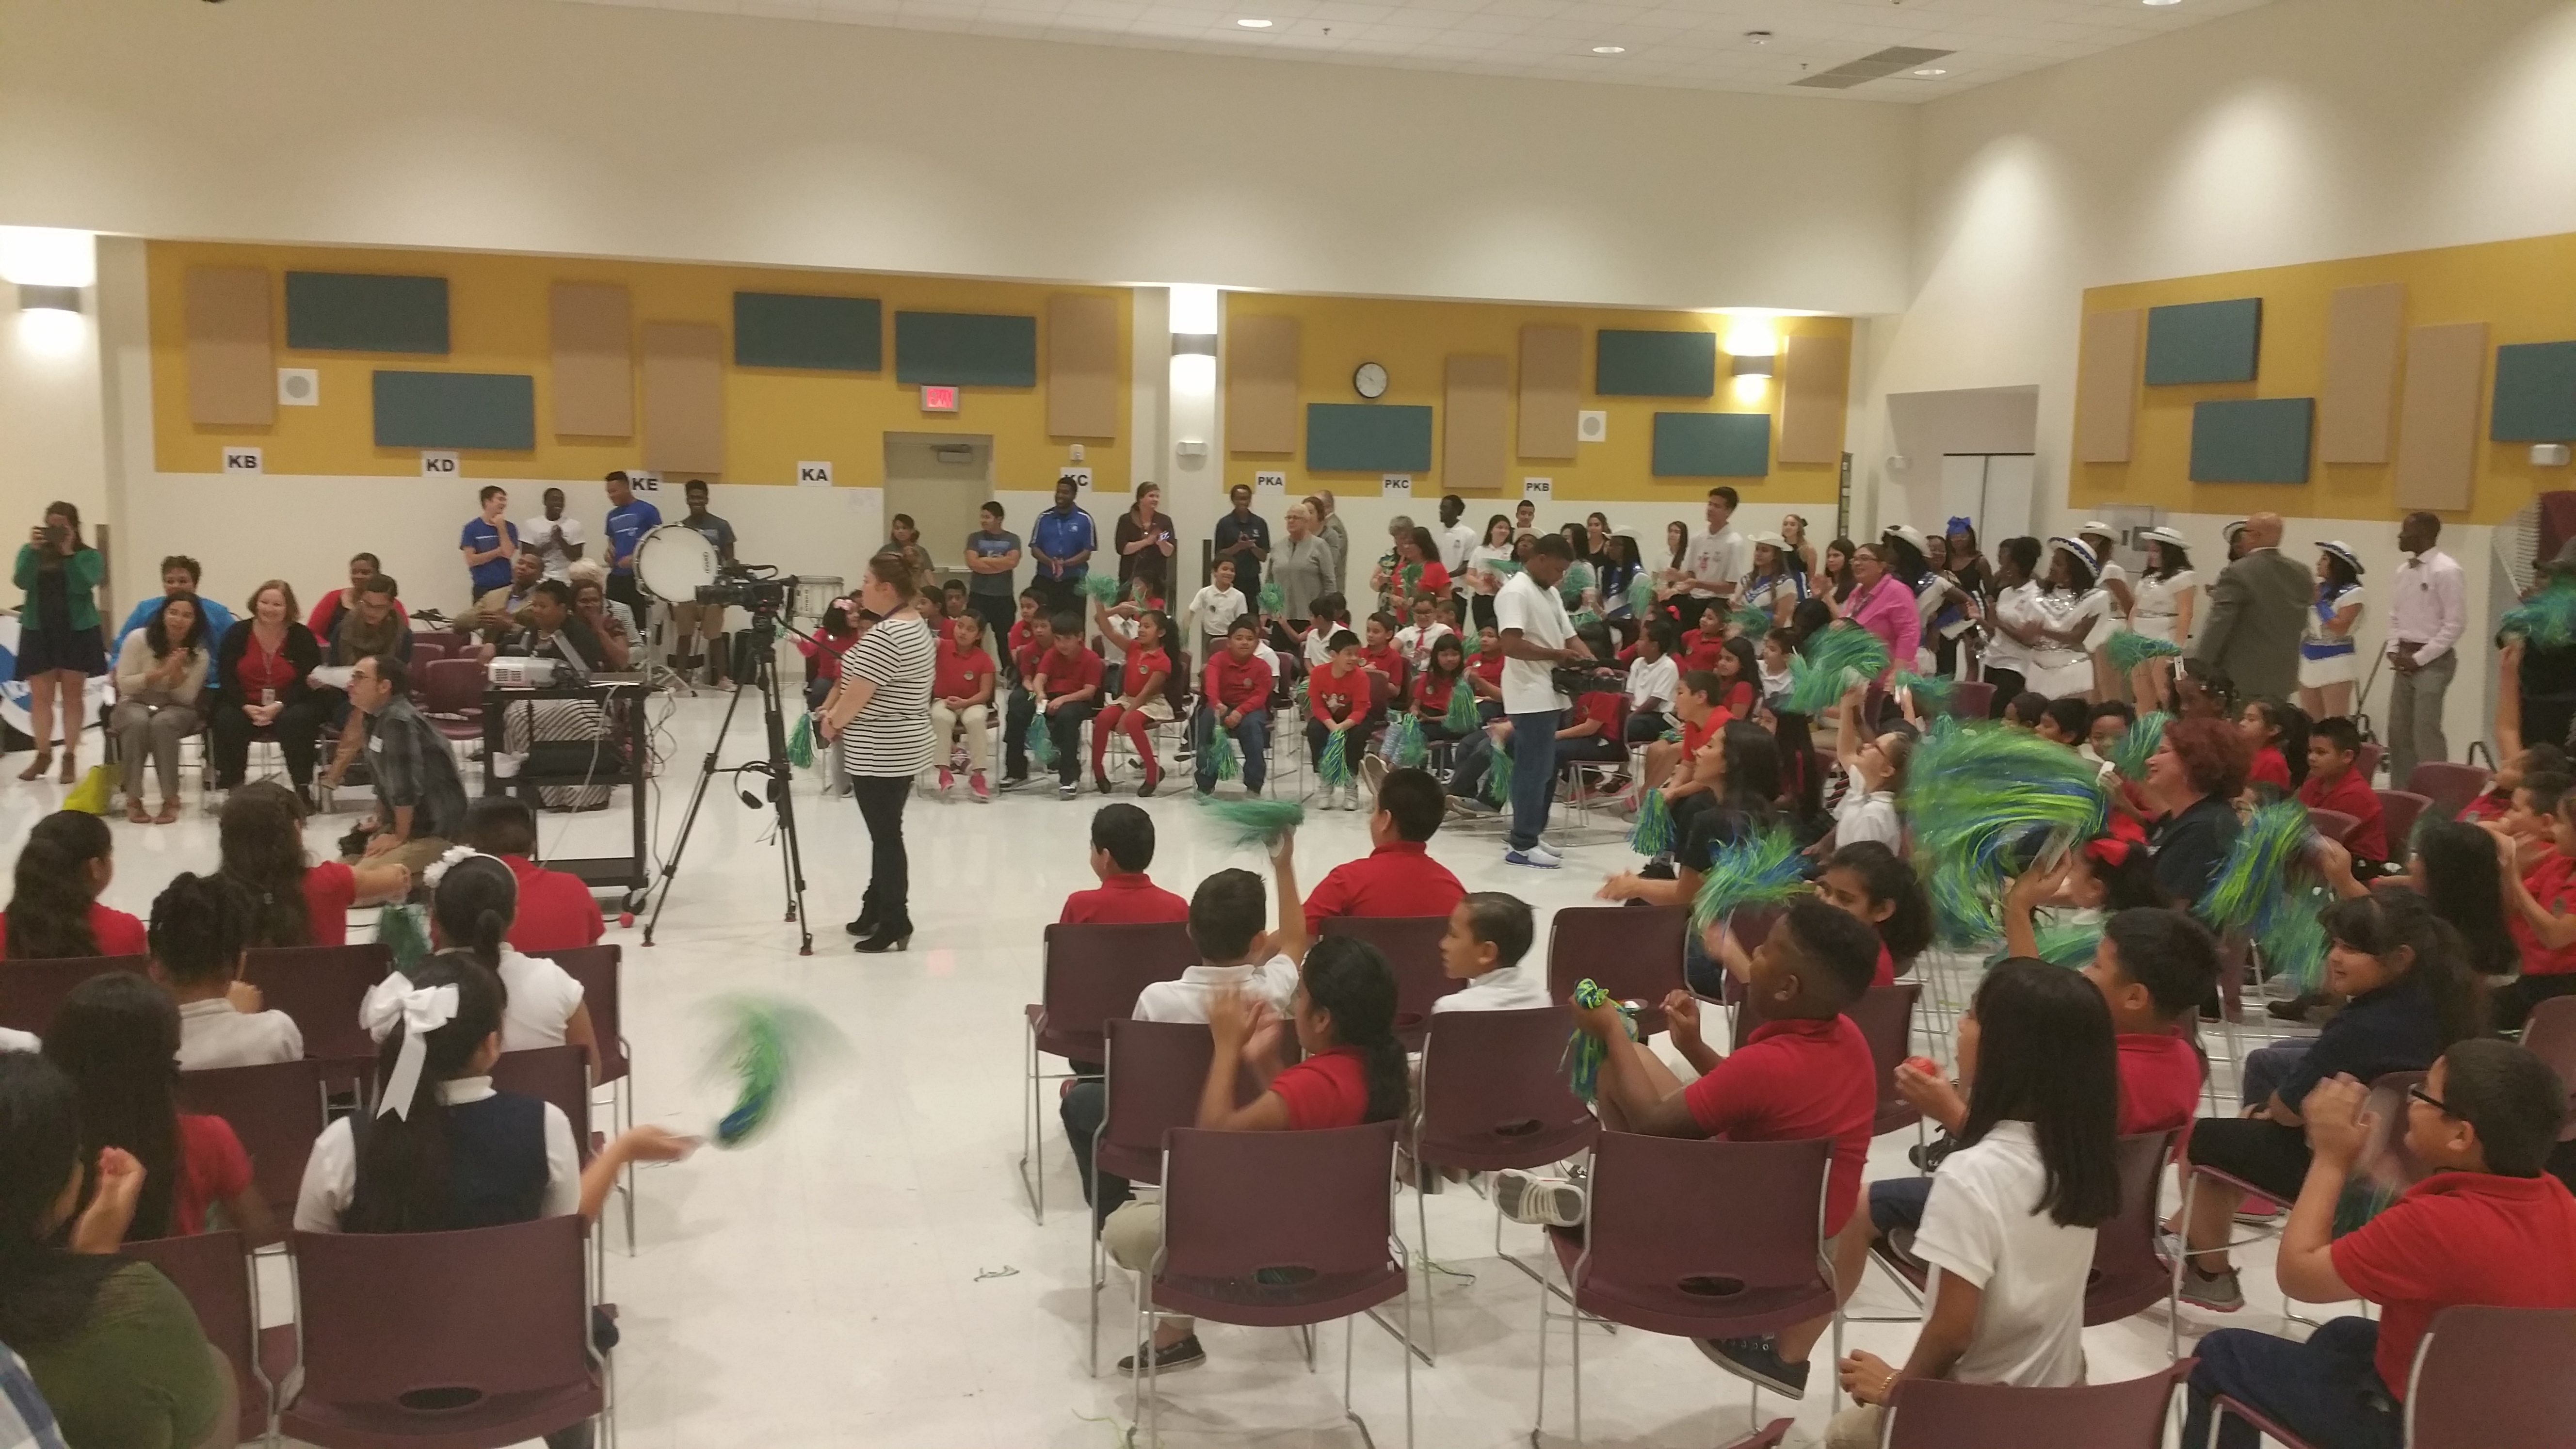 Ebby Halliday Elementary School / Ebby Halliday Elementary School